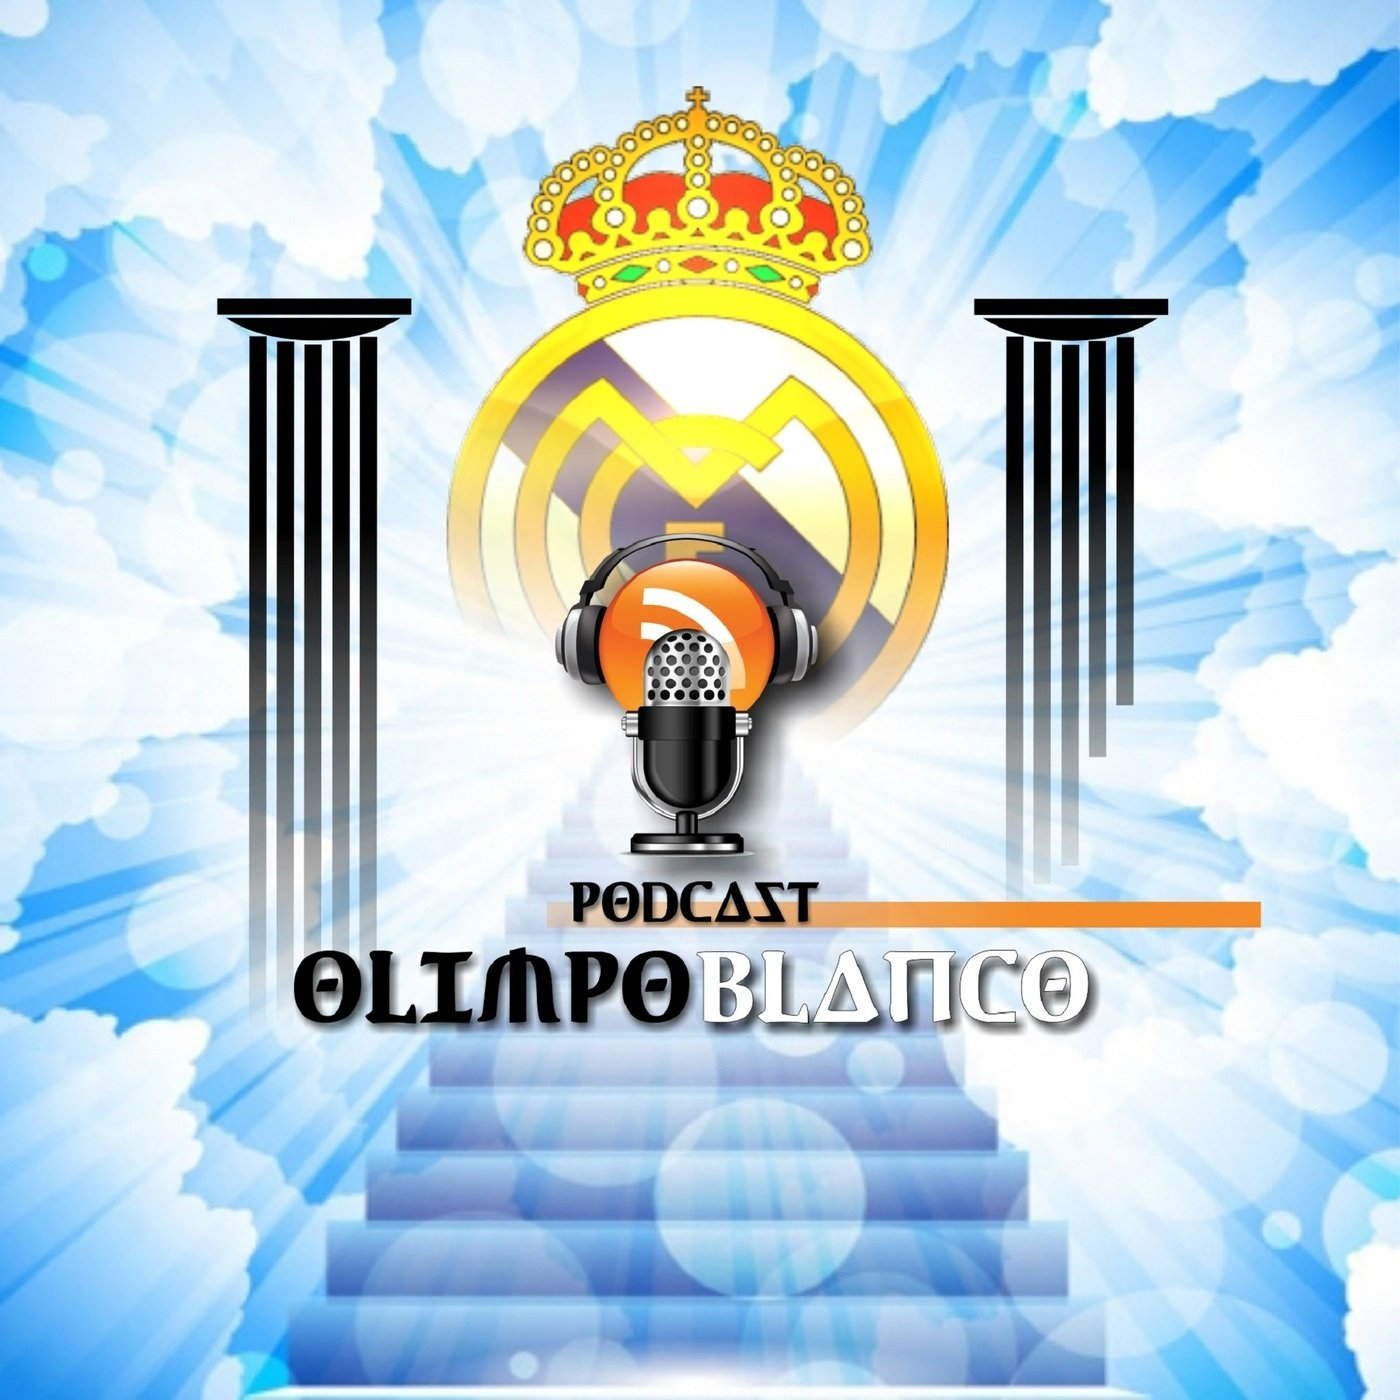 <![CDATA[Olimpo Blanco]]>